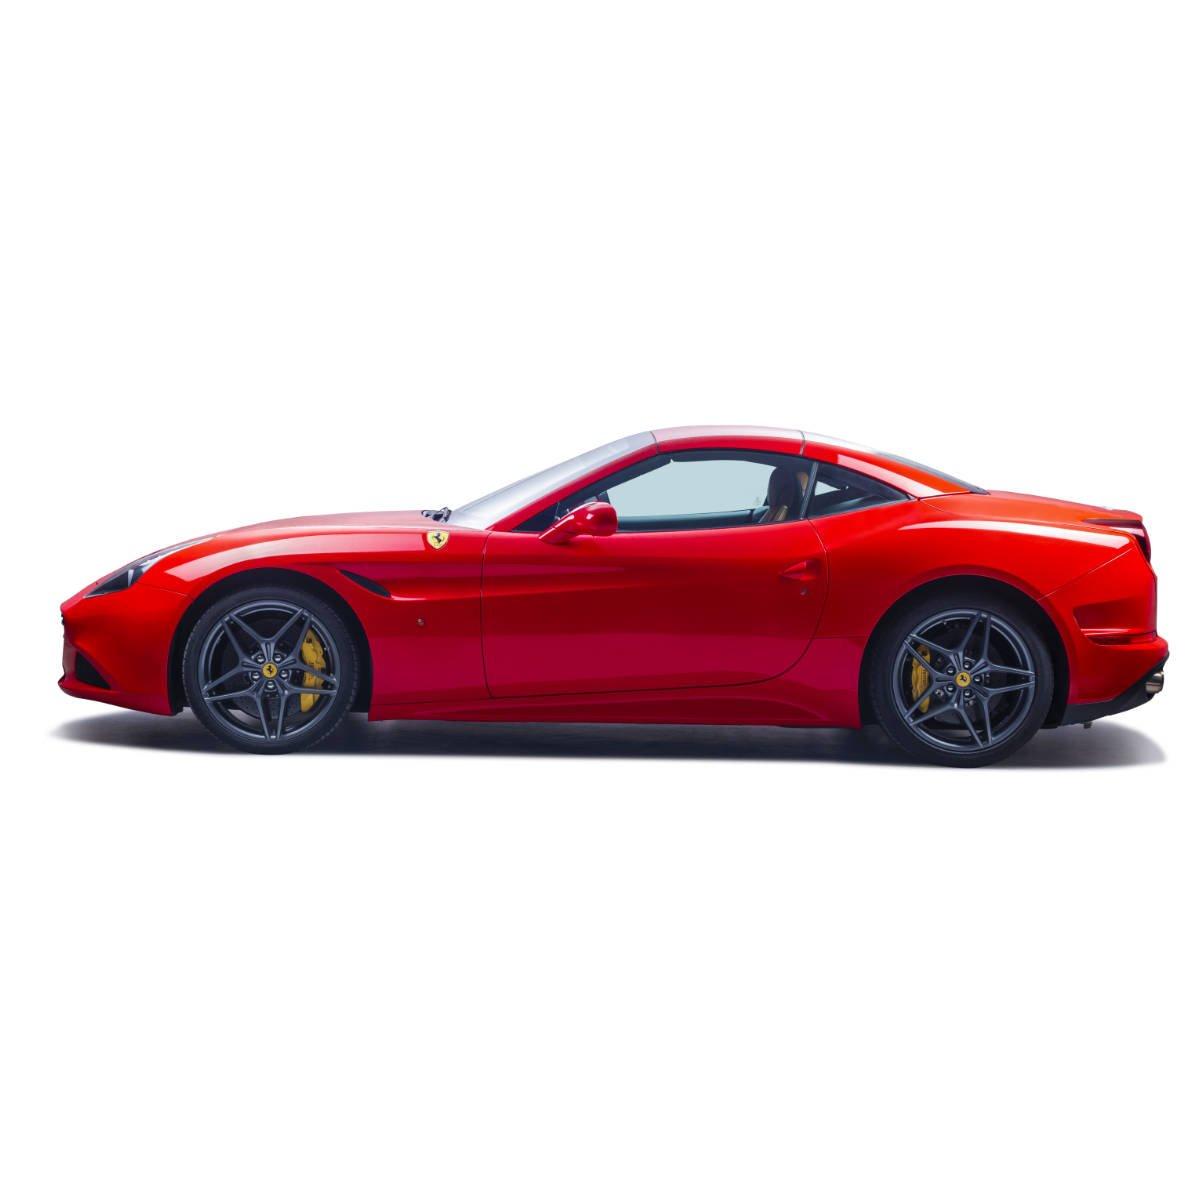 4 Seat Ferrari: Test Drive Ferrari California T (4 Seats)